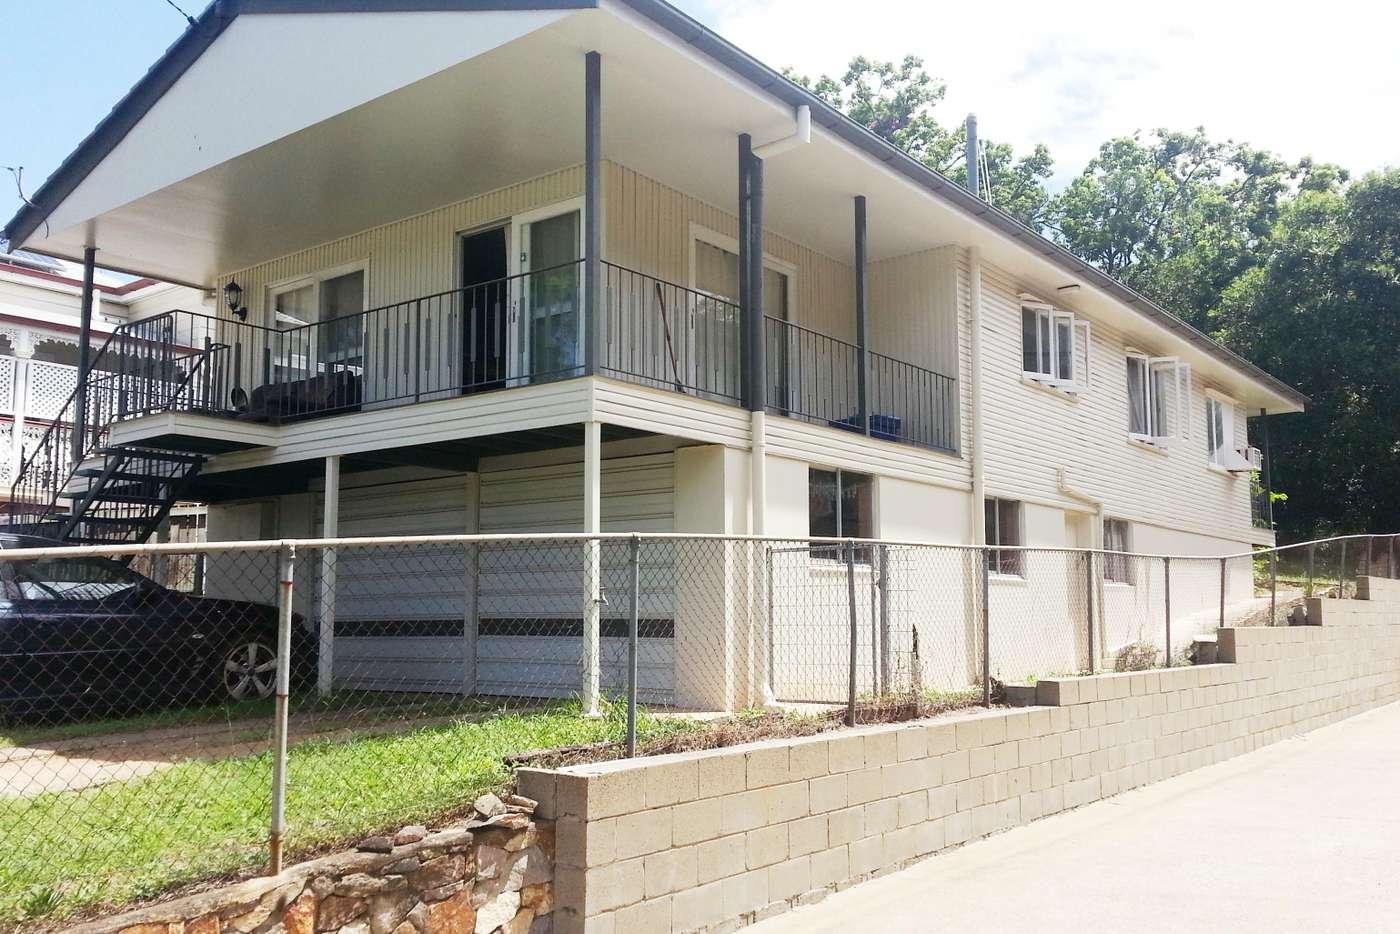 Main view of Homely house listing, 7 Lucinda Street, Taringa QLD 4068